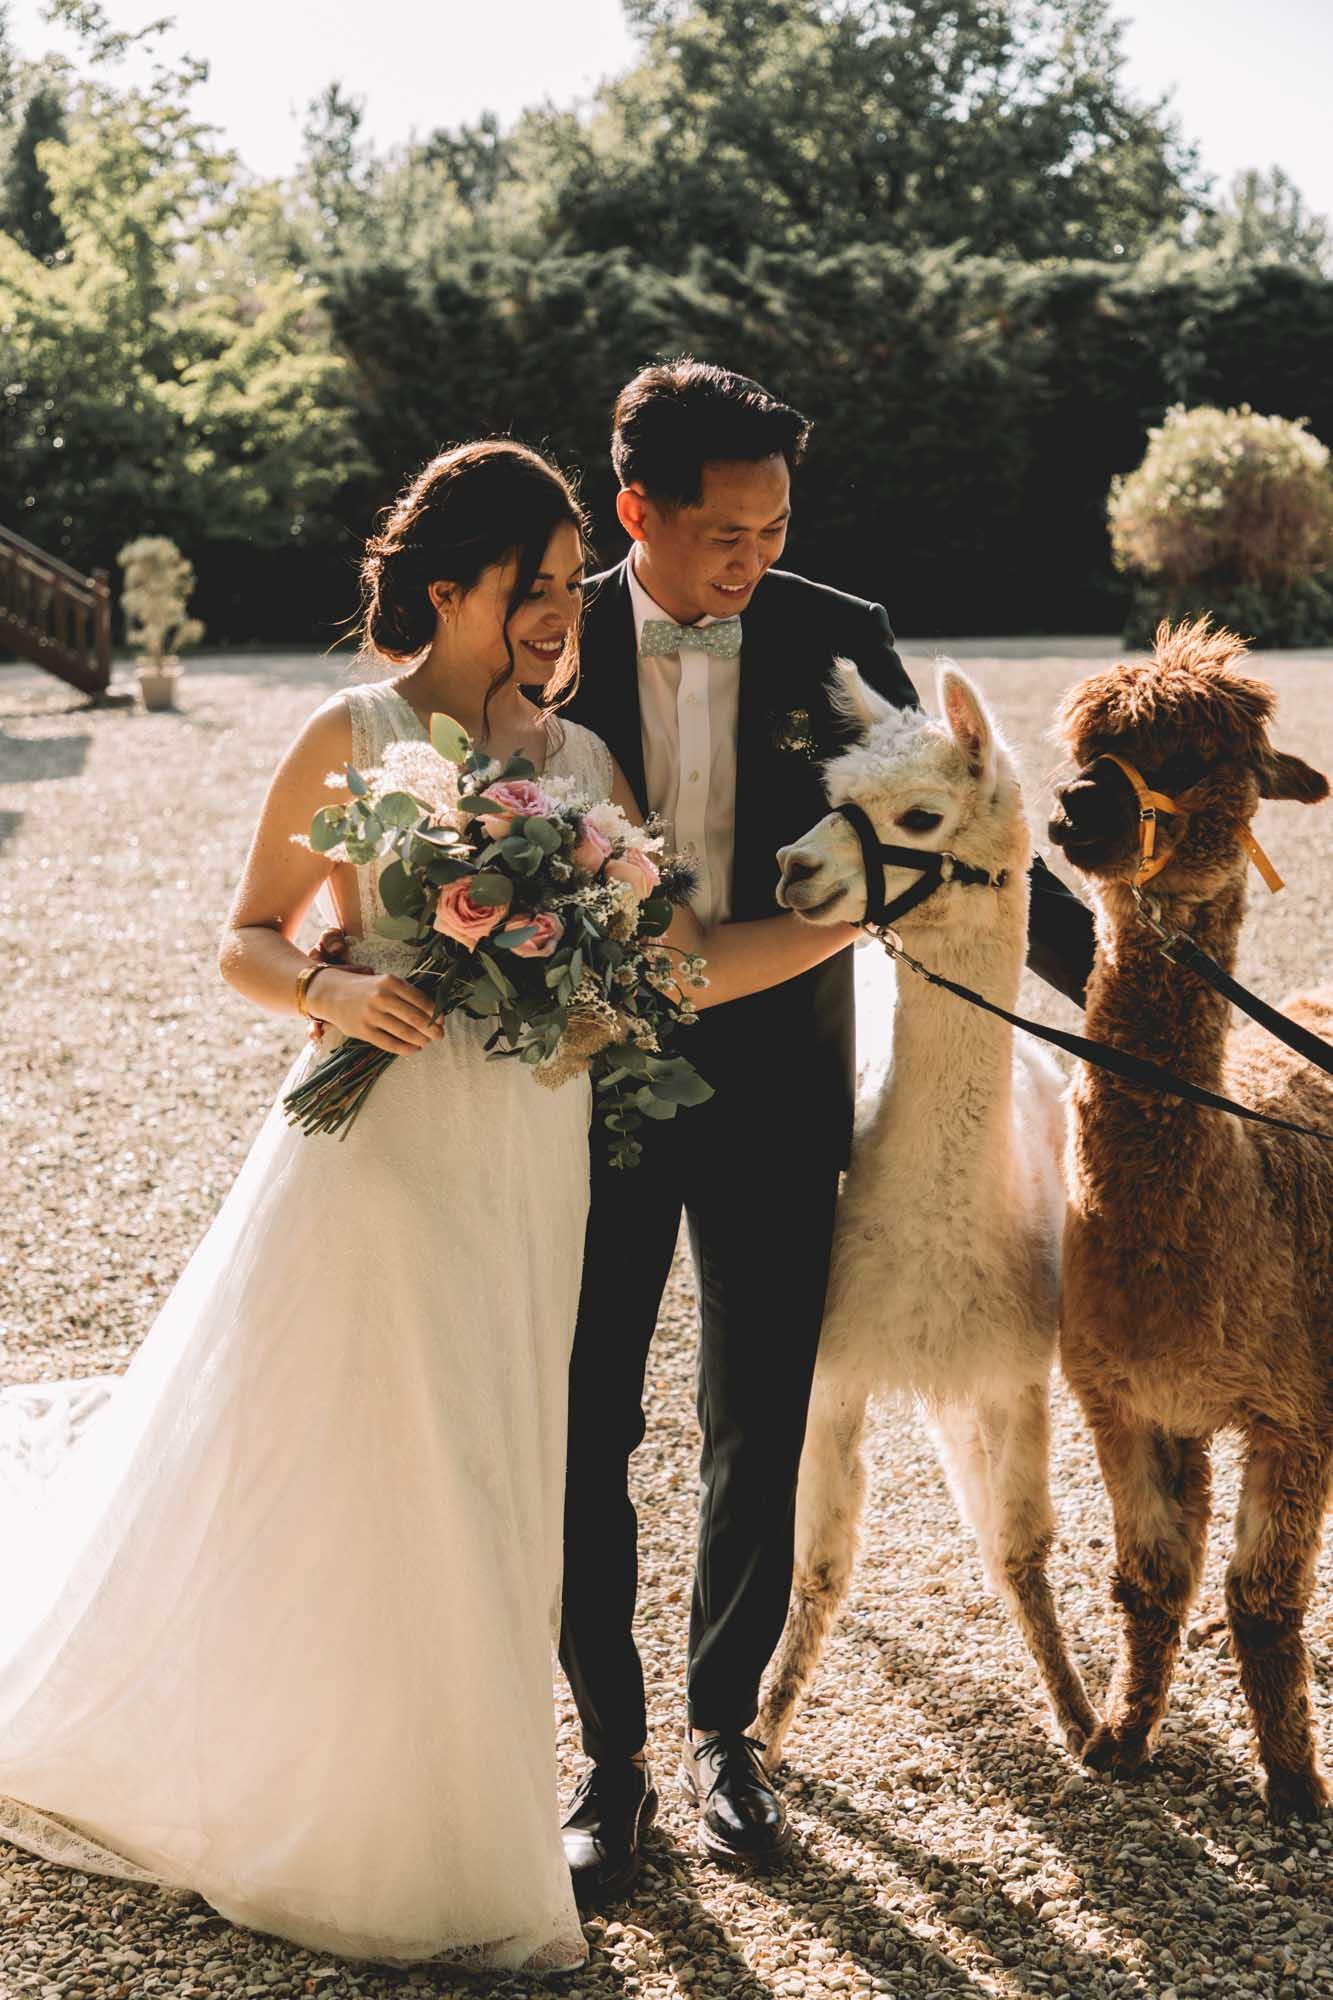 SOPHIA+THIBAUD_MANOIR SAINT HUBERT_PHOTOGRAPHE_MARIAGE_LES BANDITS-39